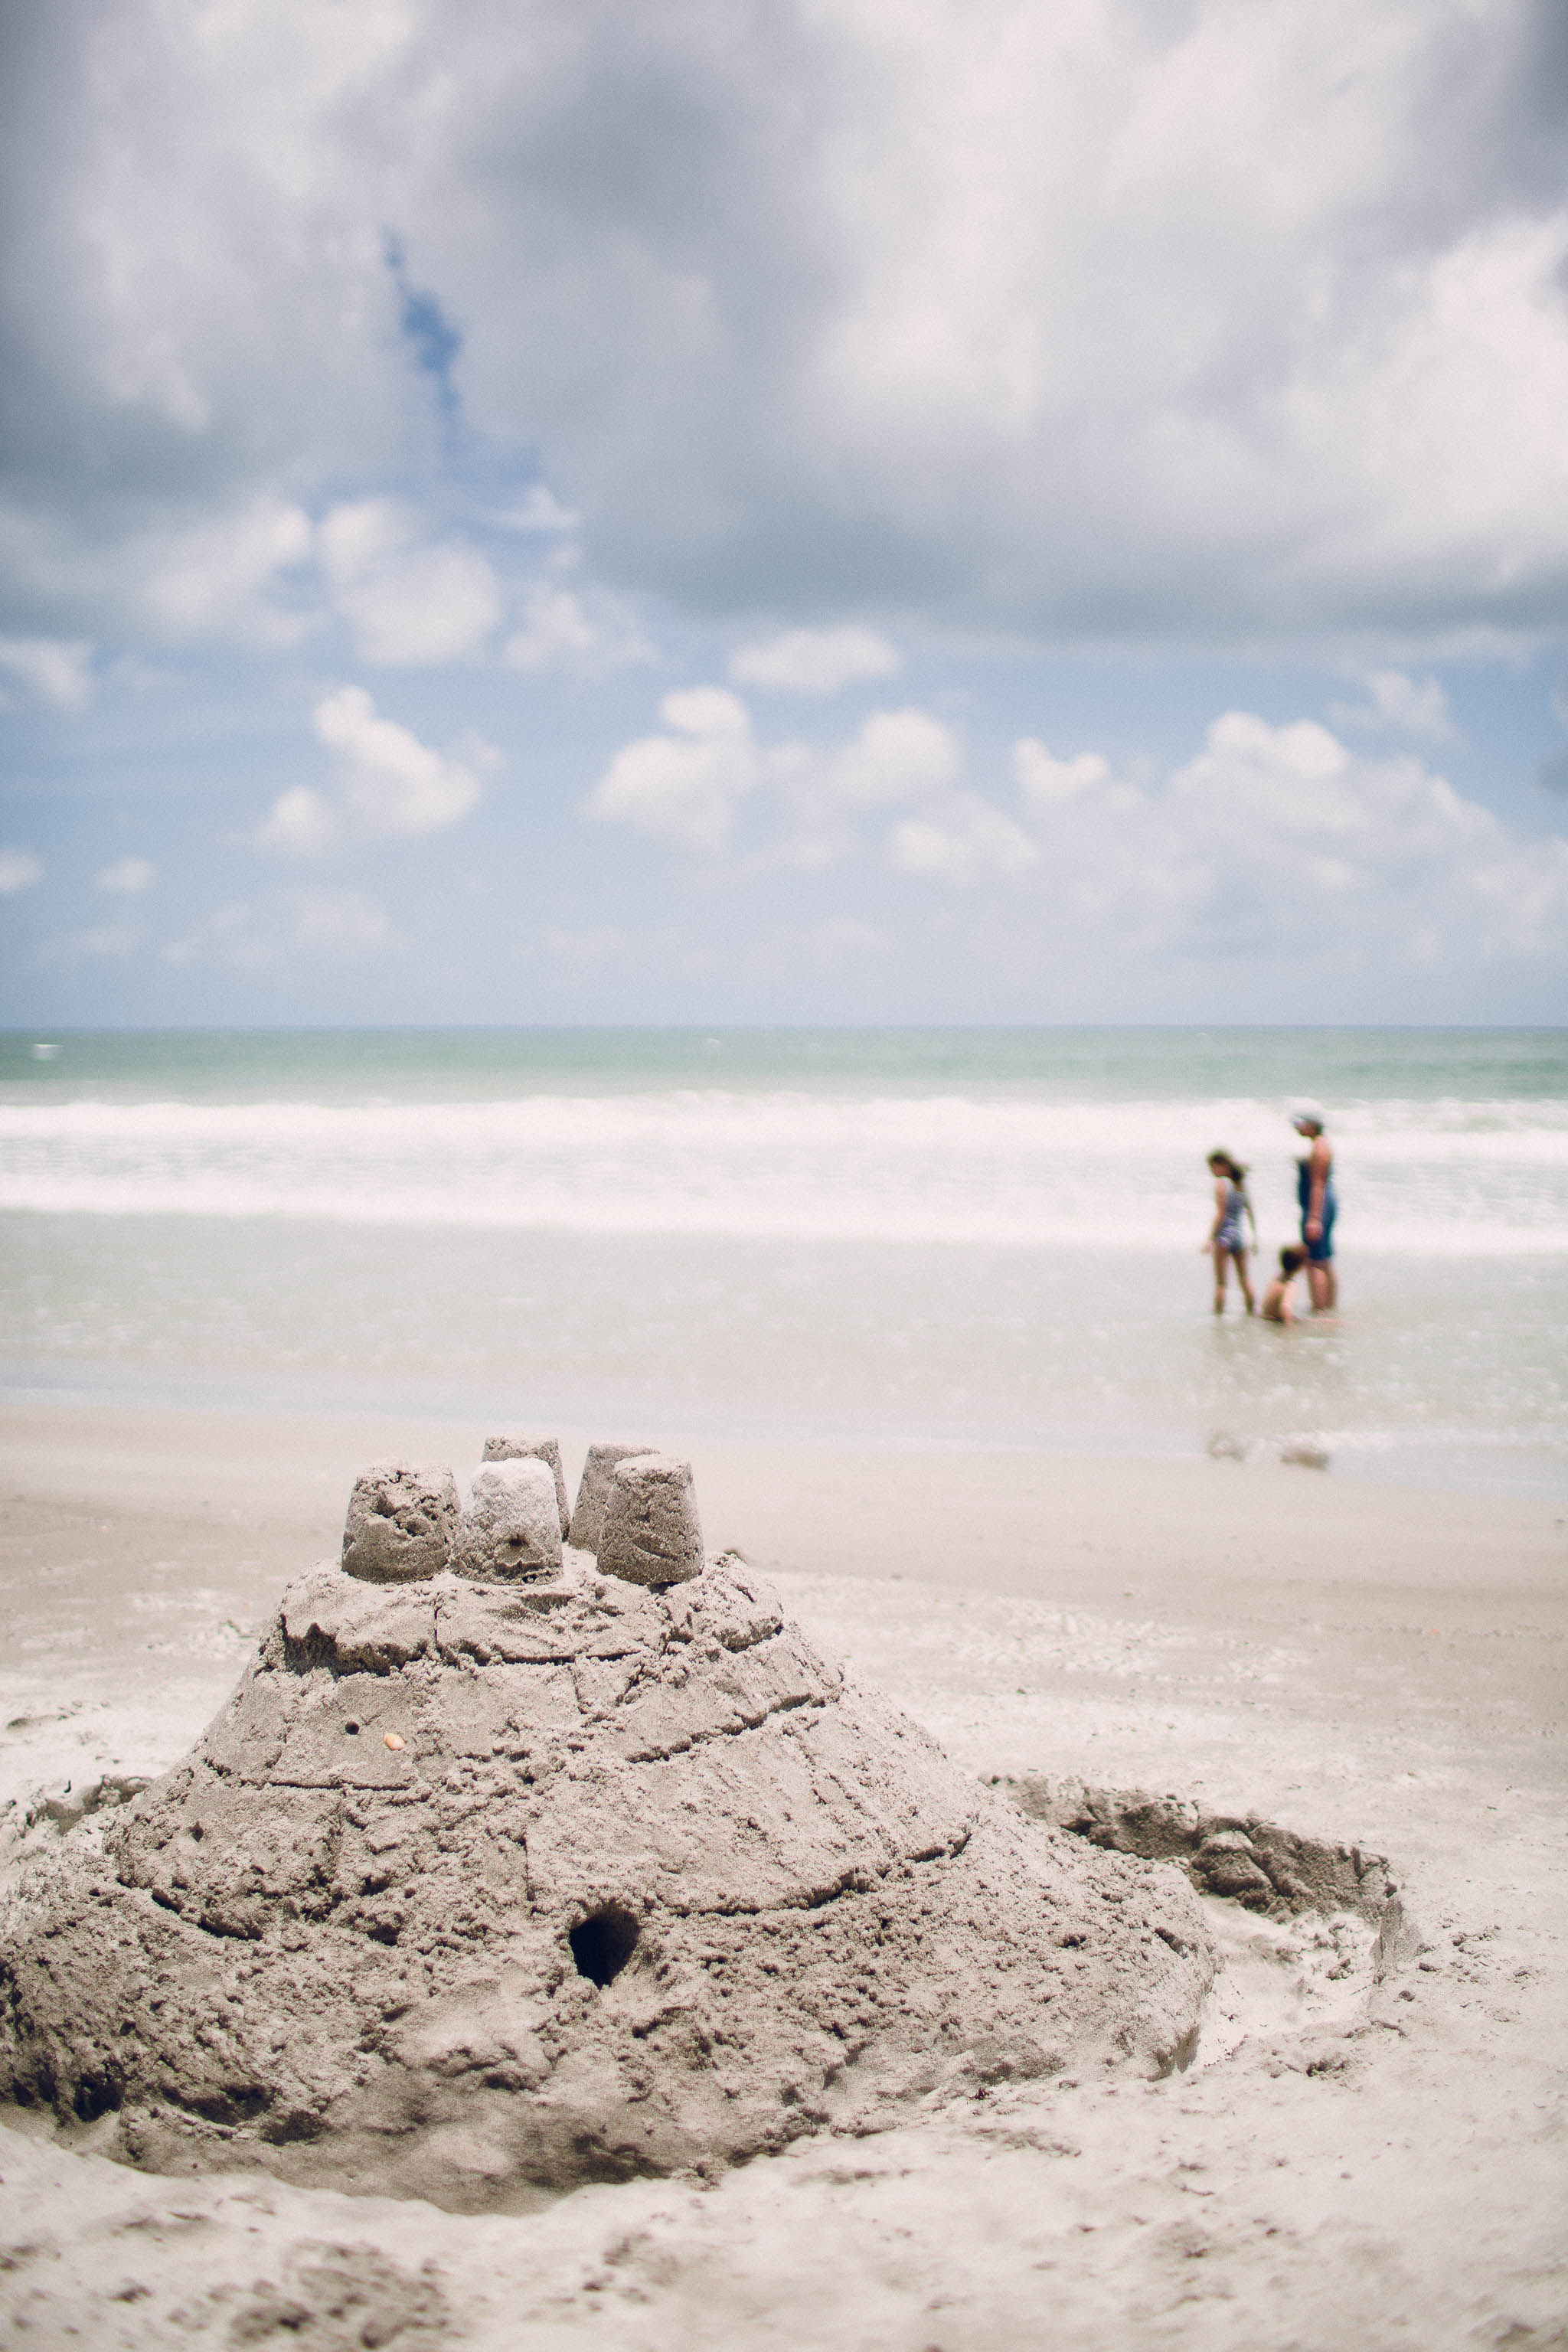 Florida-Lorraine-Yeung-2.jpg